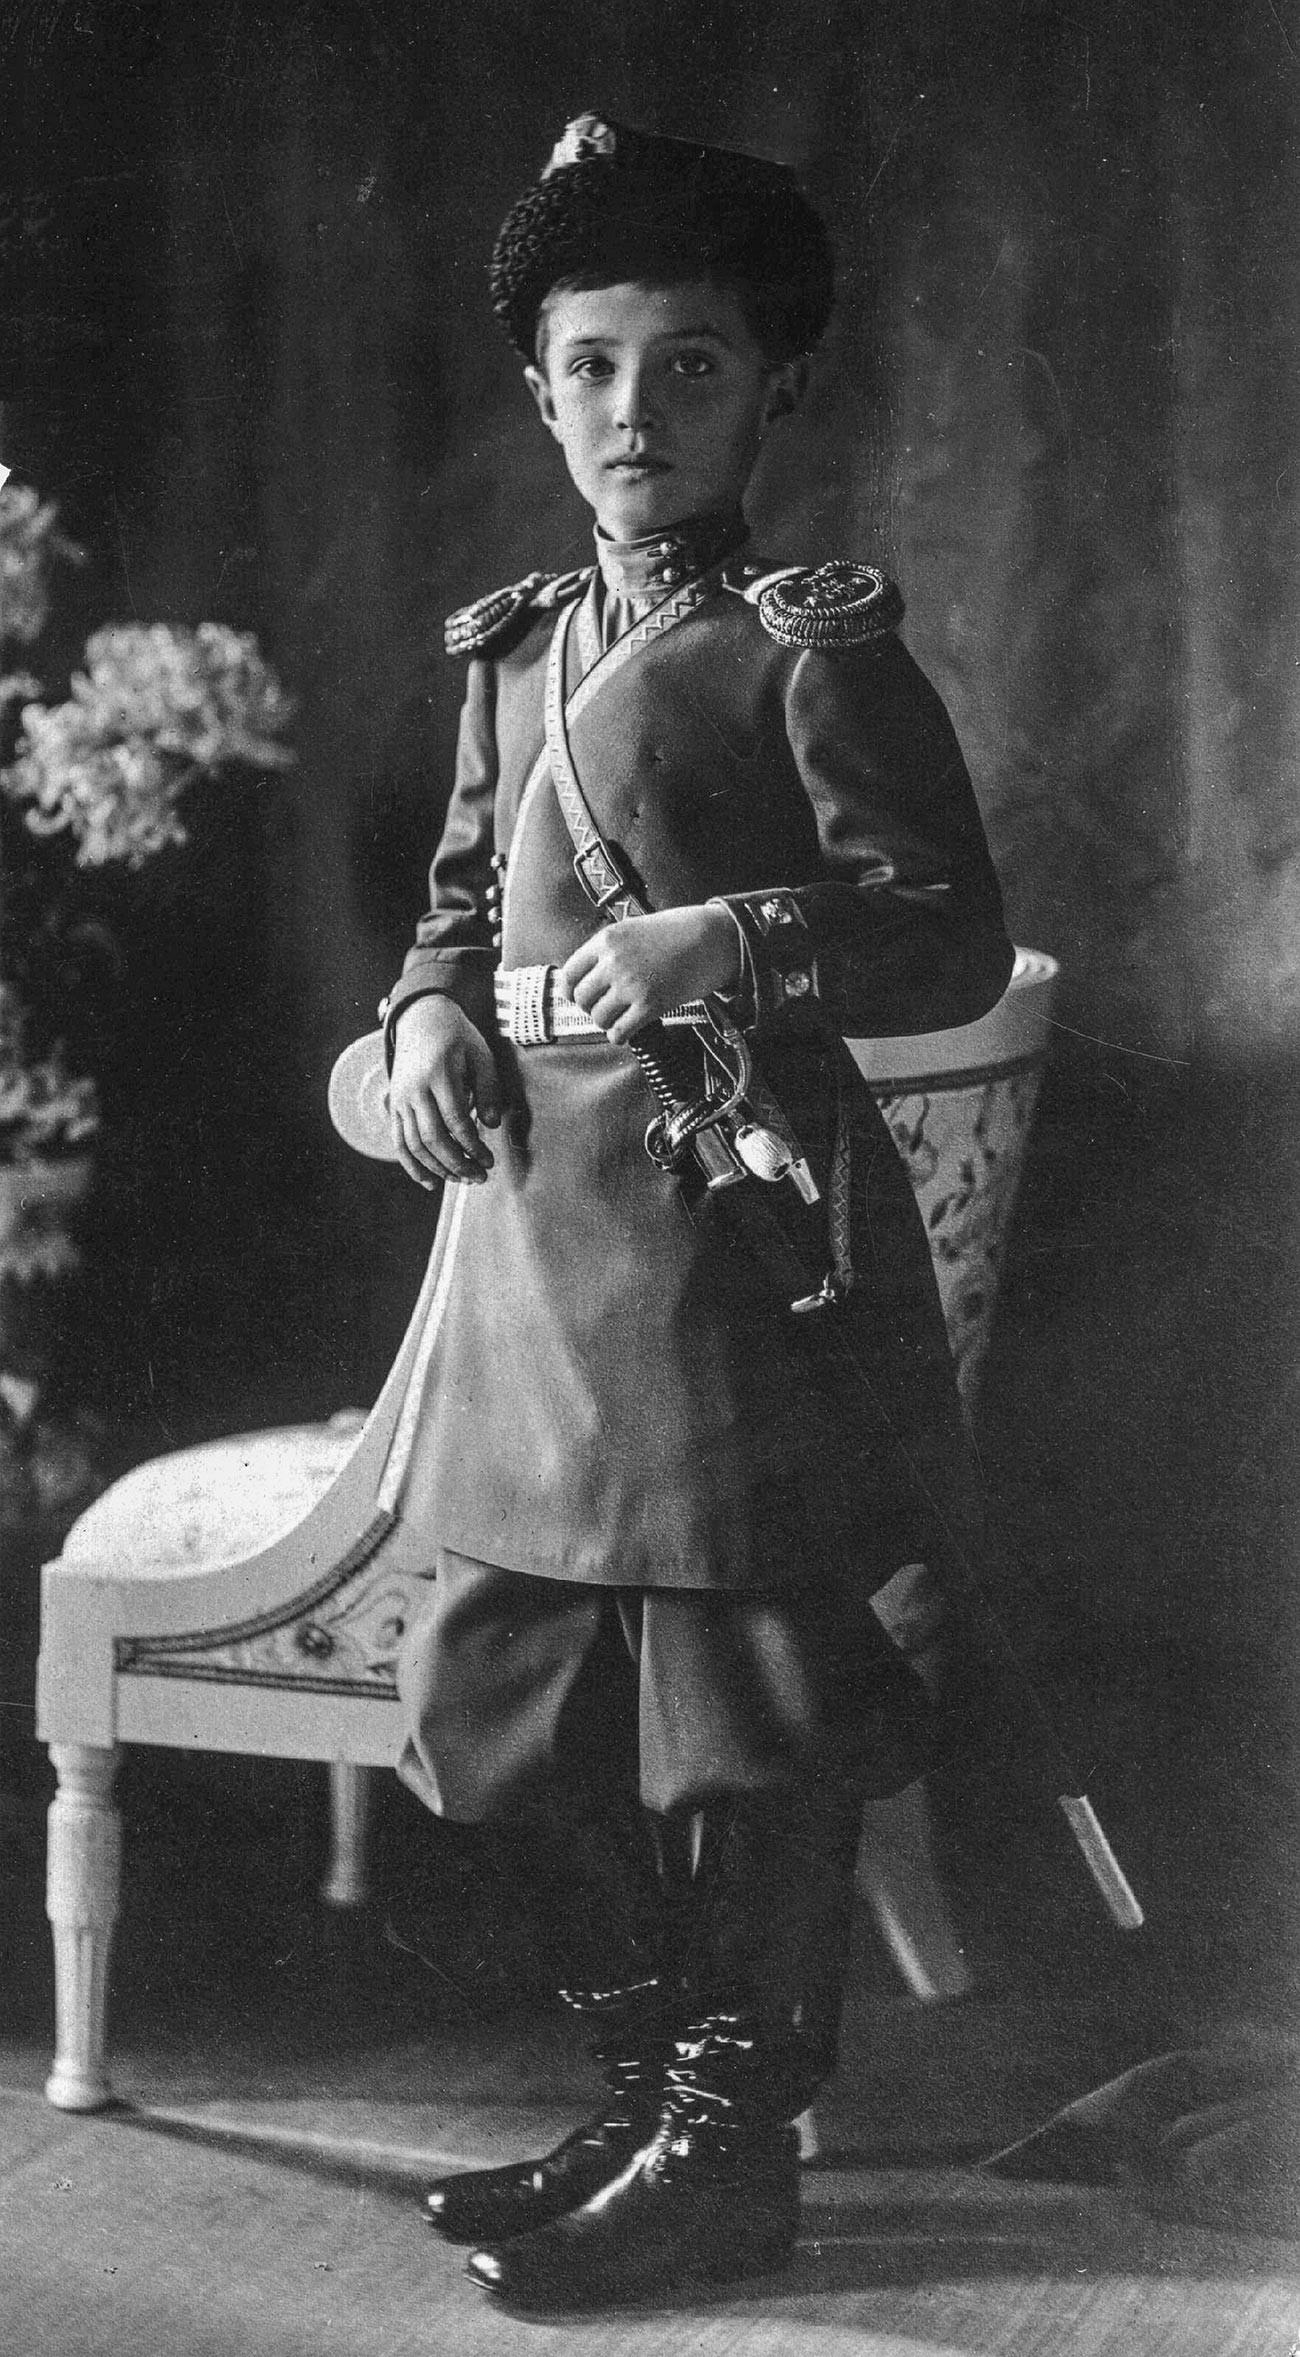 Tsarêvitch Aleksêi Nikoláievitch (1904 - 1918).